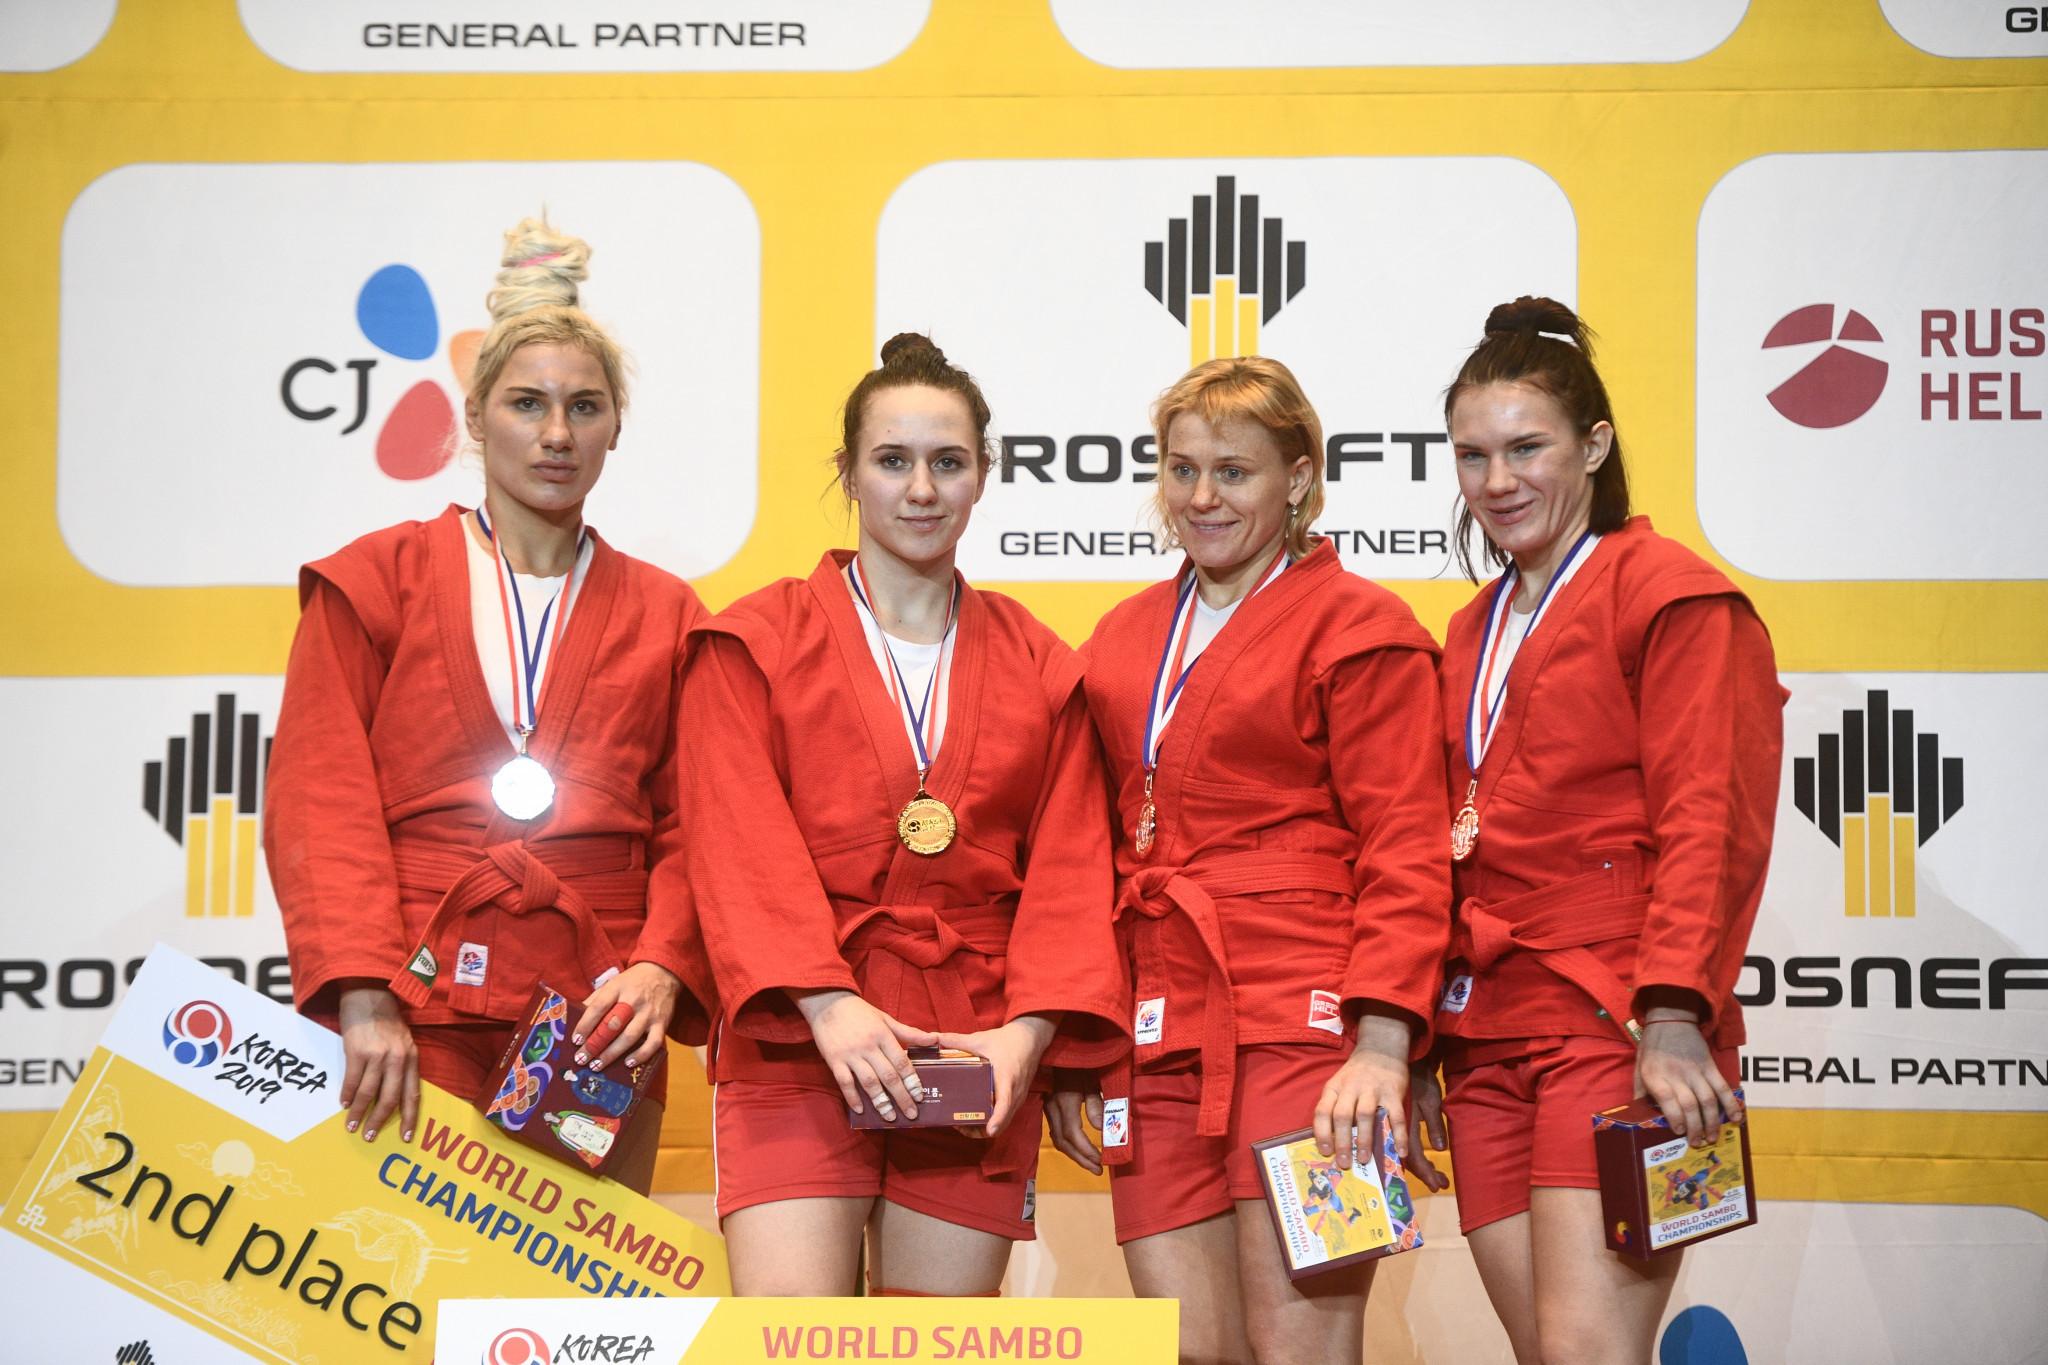 Anastasiia Khomiachkova of Russia, second left, topped the podium in the women's 72kg World Sambo Championship ©FIAS